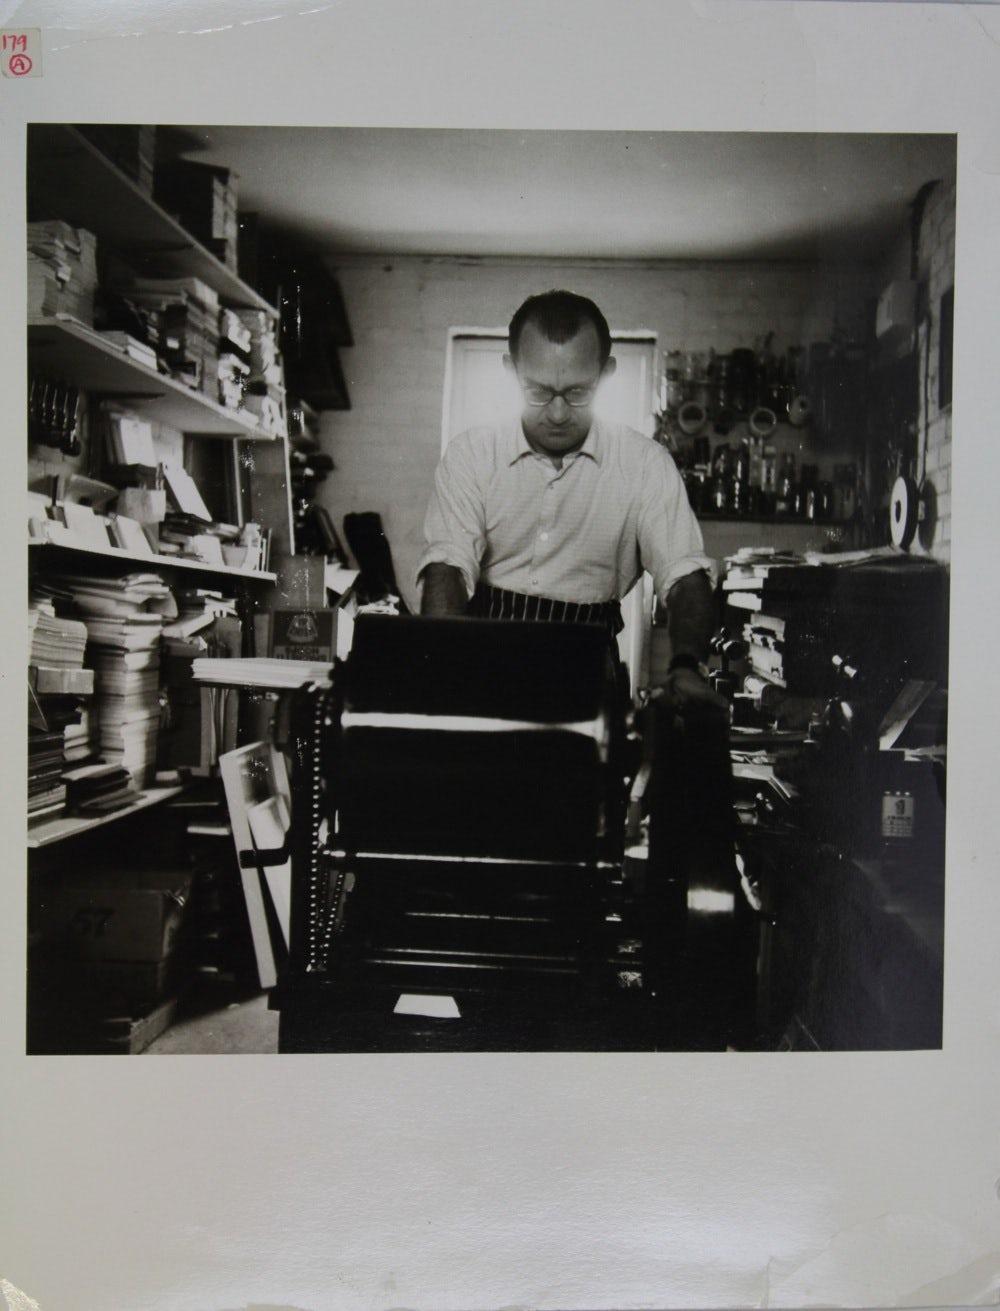 paul-peter-piech-working-in-his-studio-in-bushley-heath-crsite-crsite